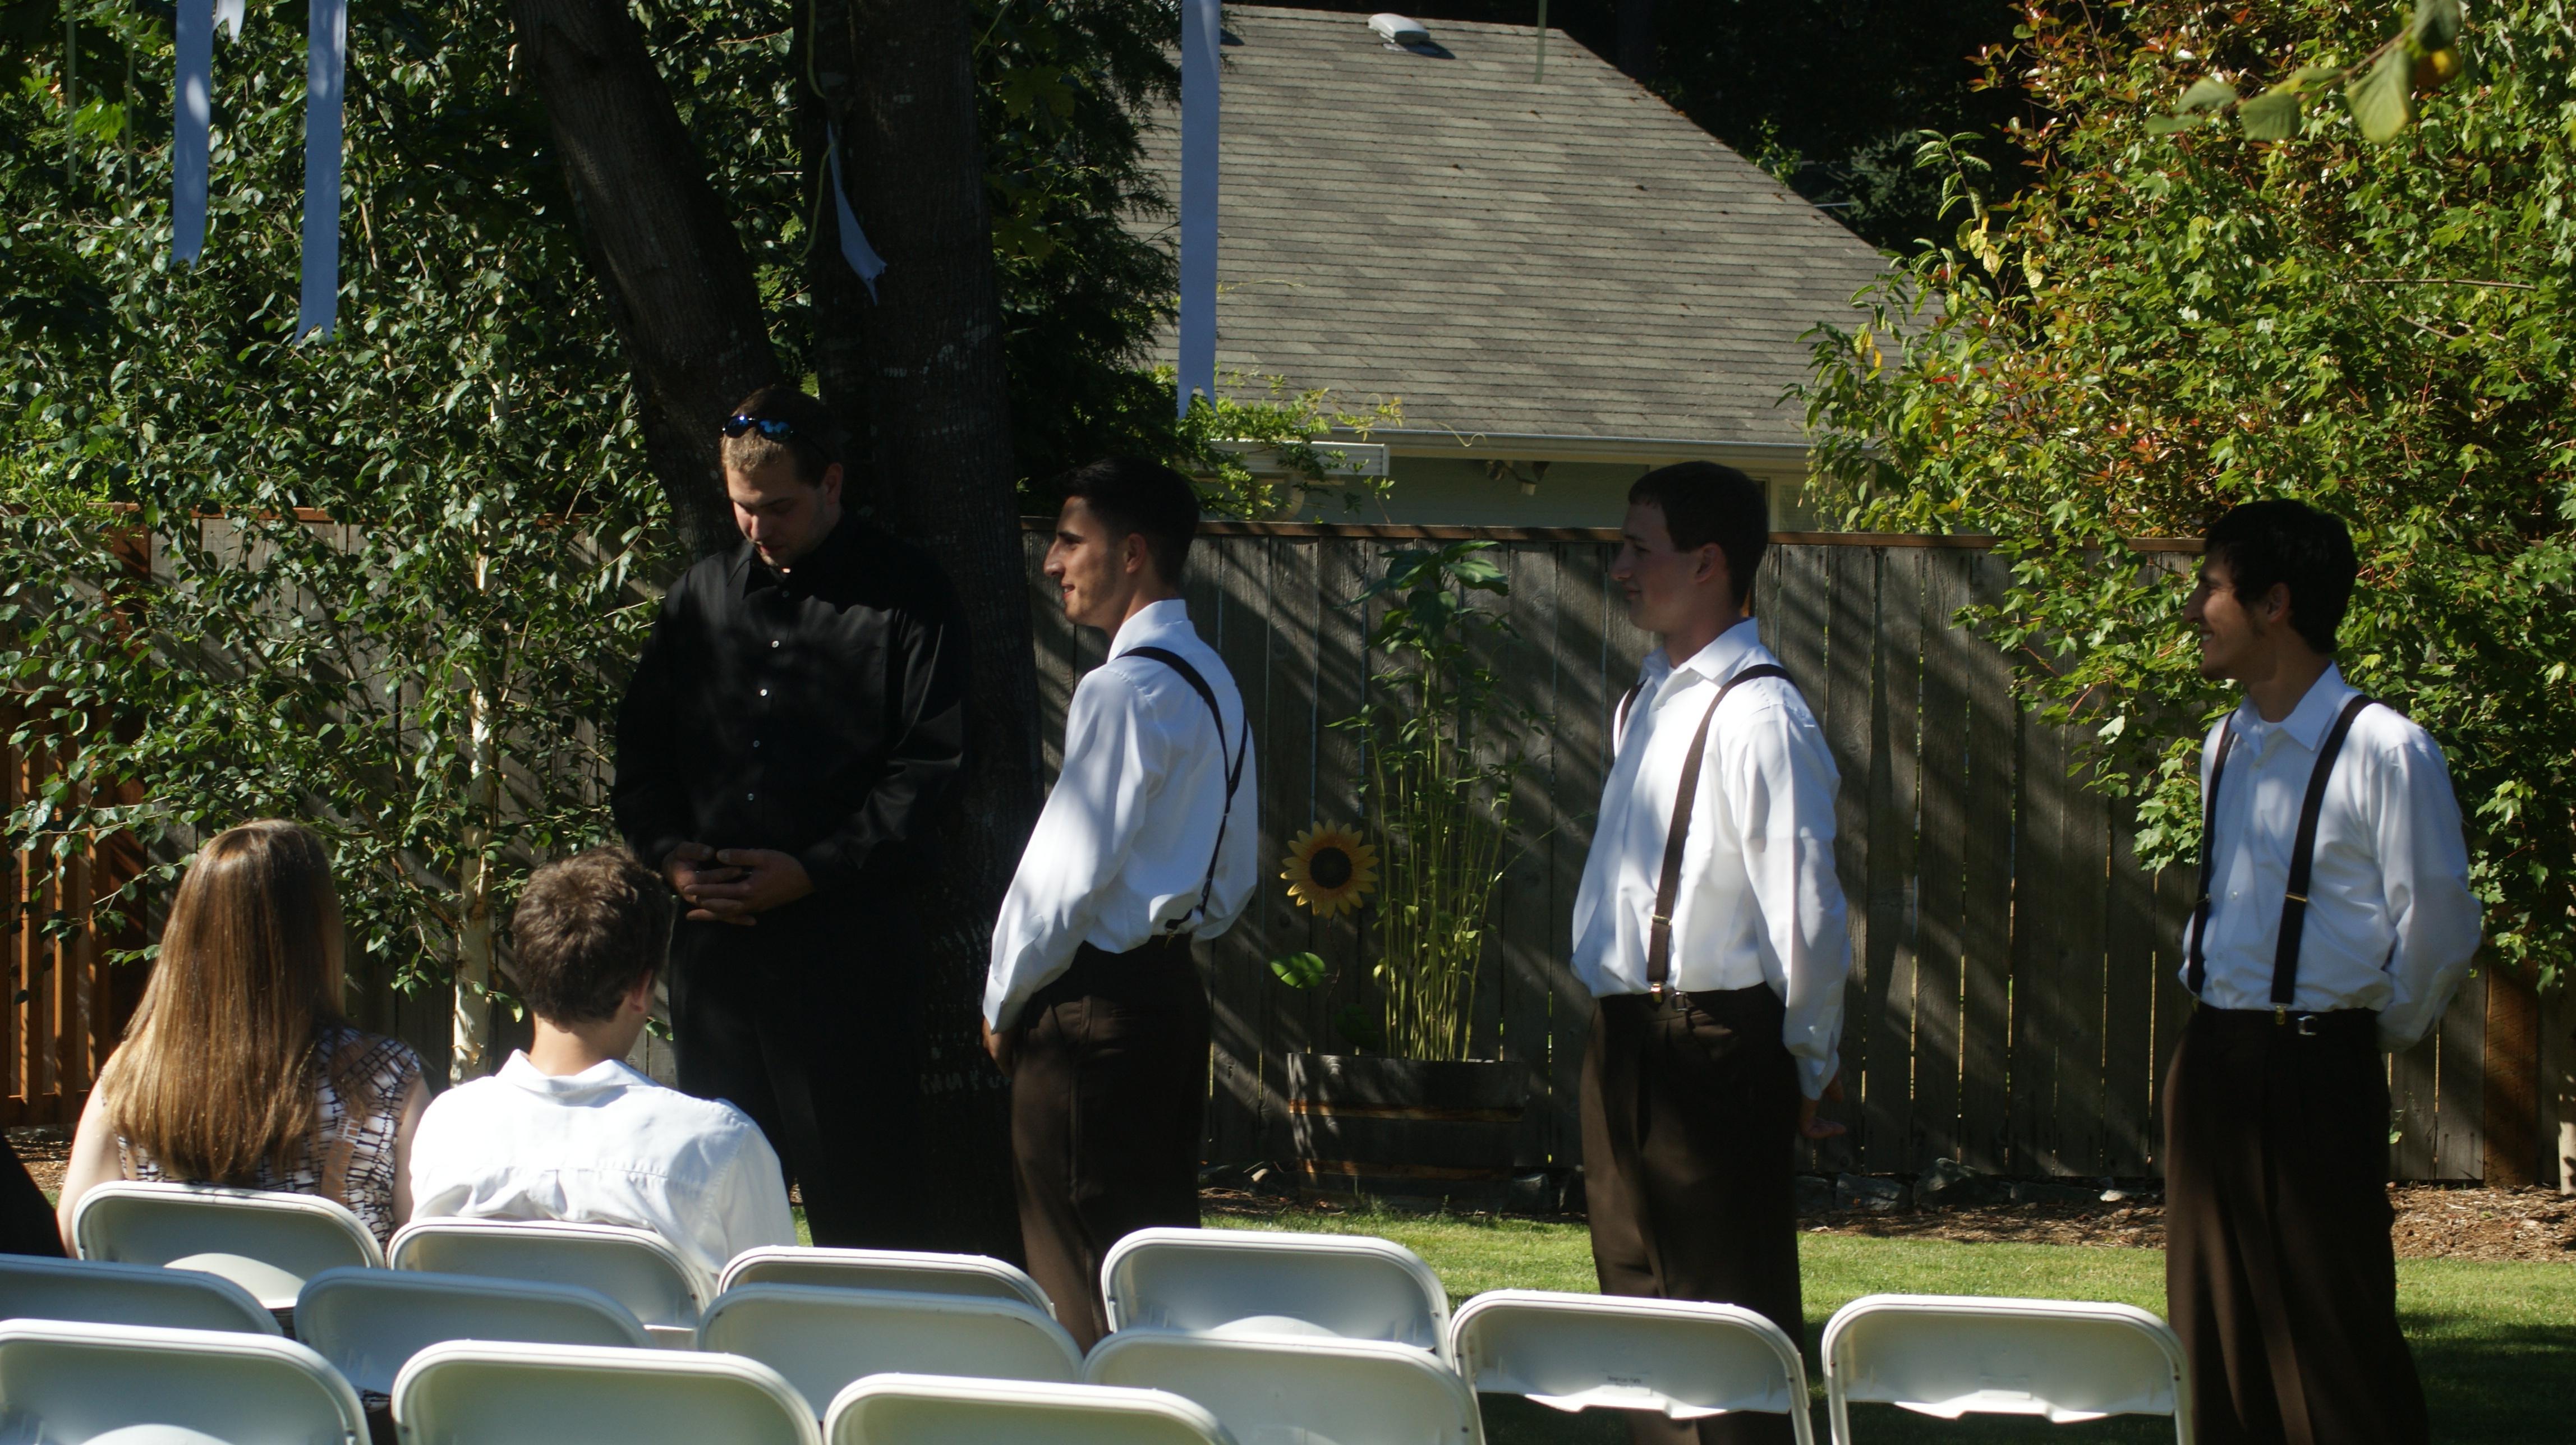 Ceremony, Flowers & Decor, brown, Vintage, Outdoor, Suspenders, Groomesmen